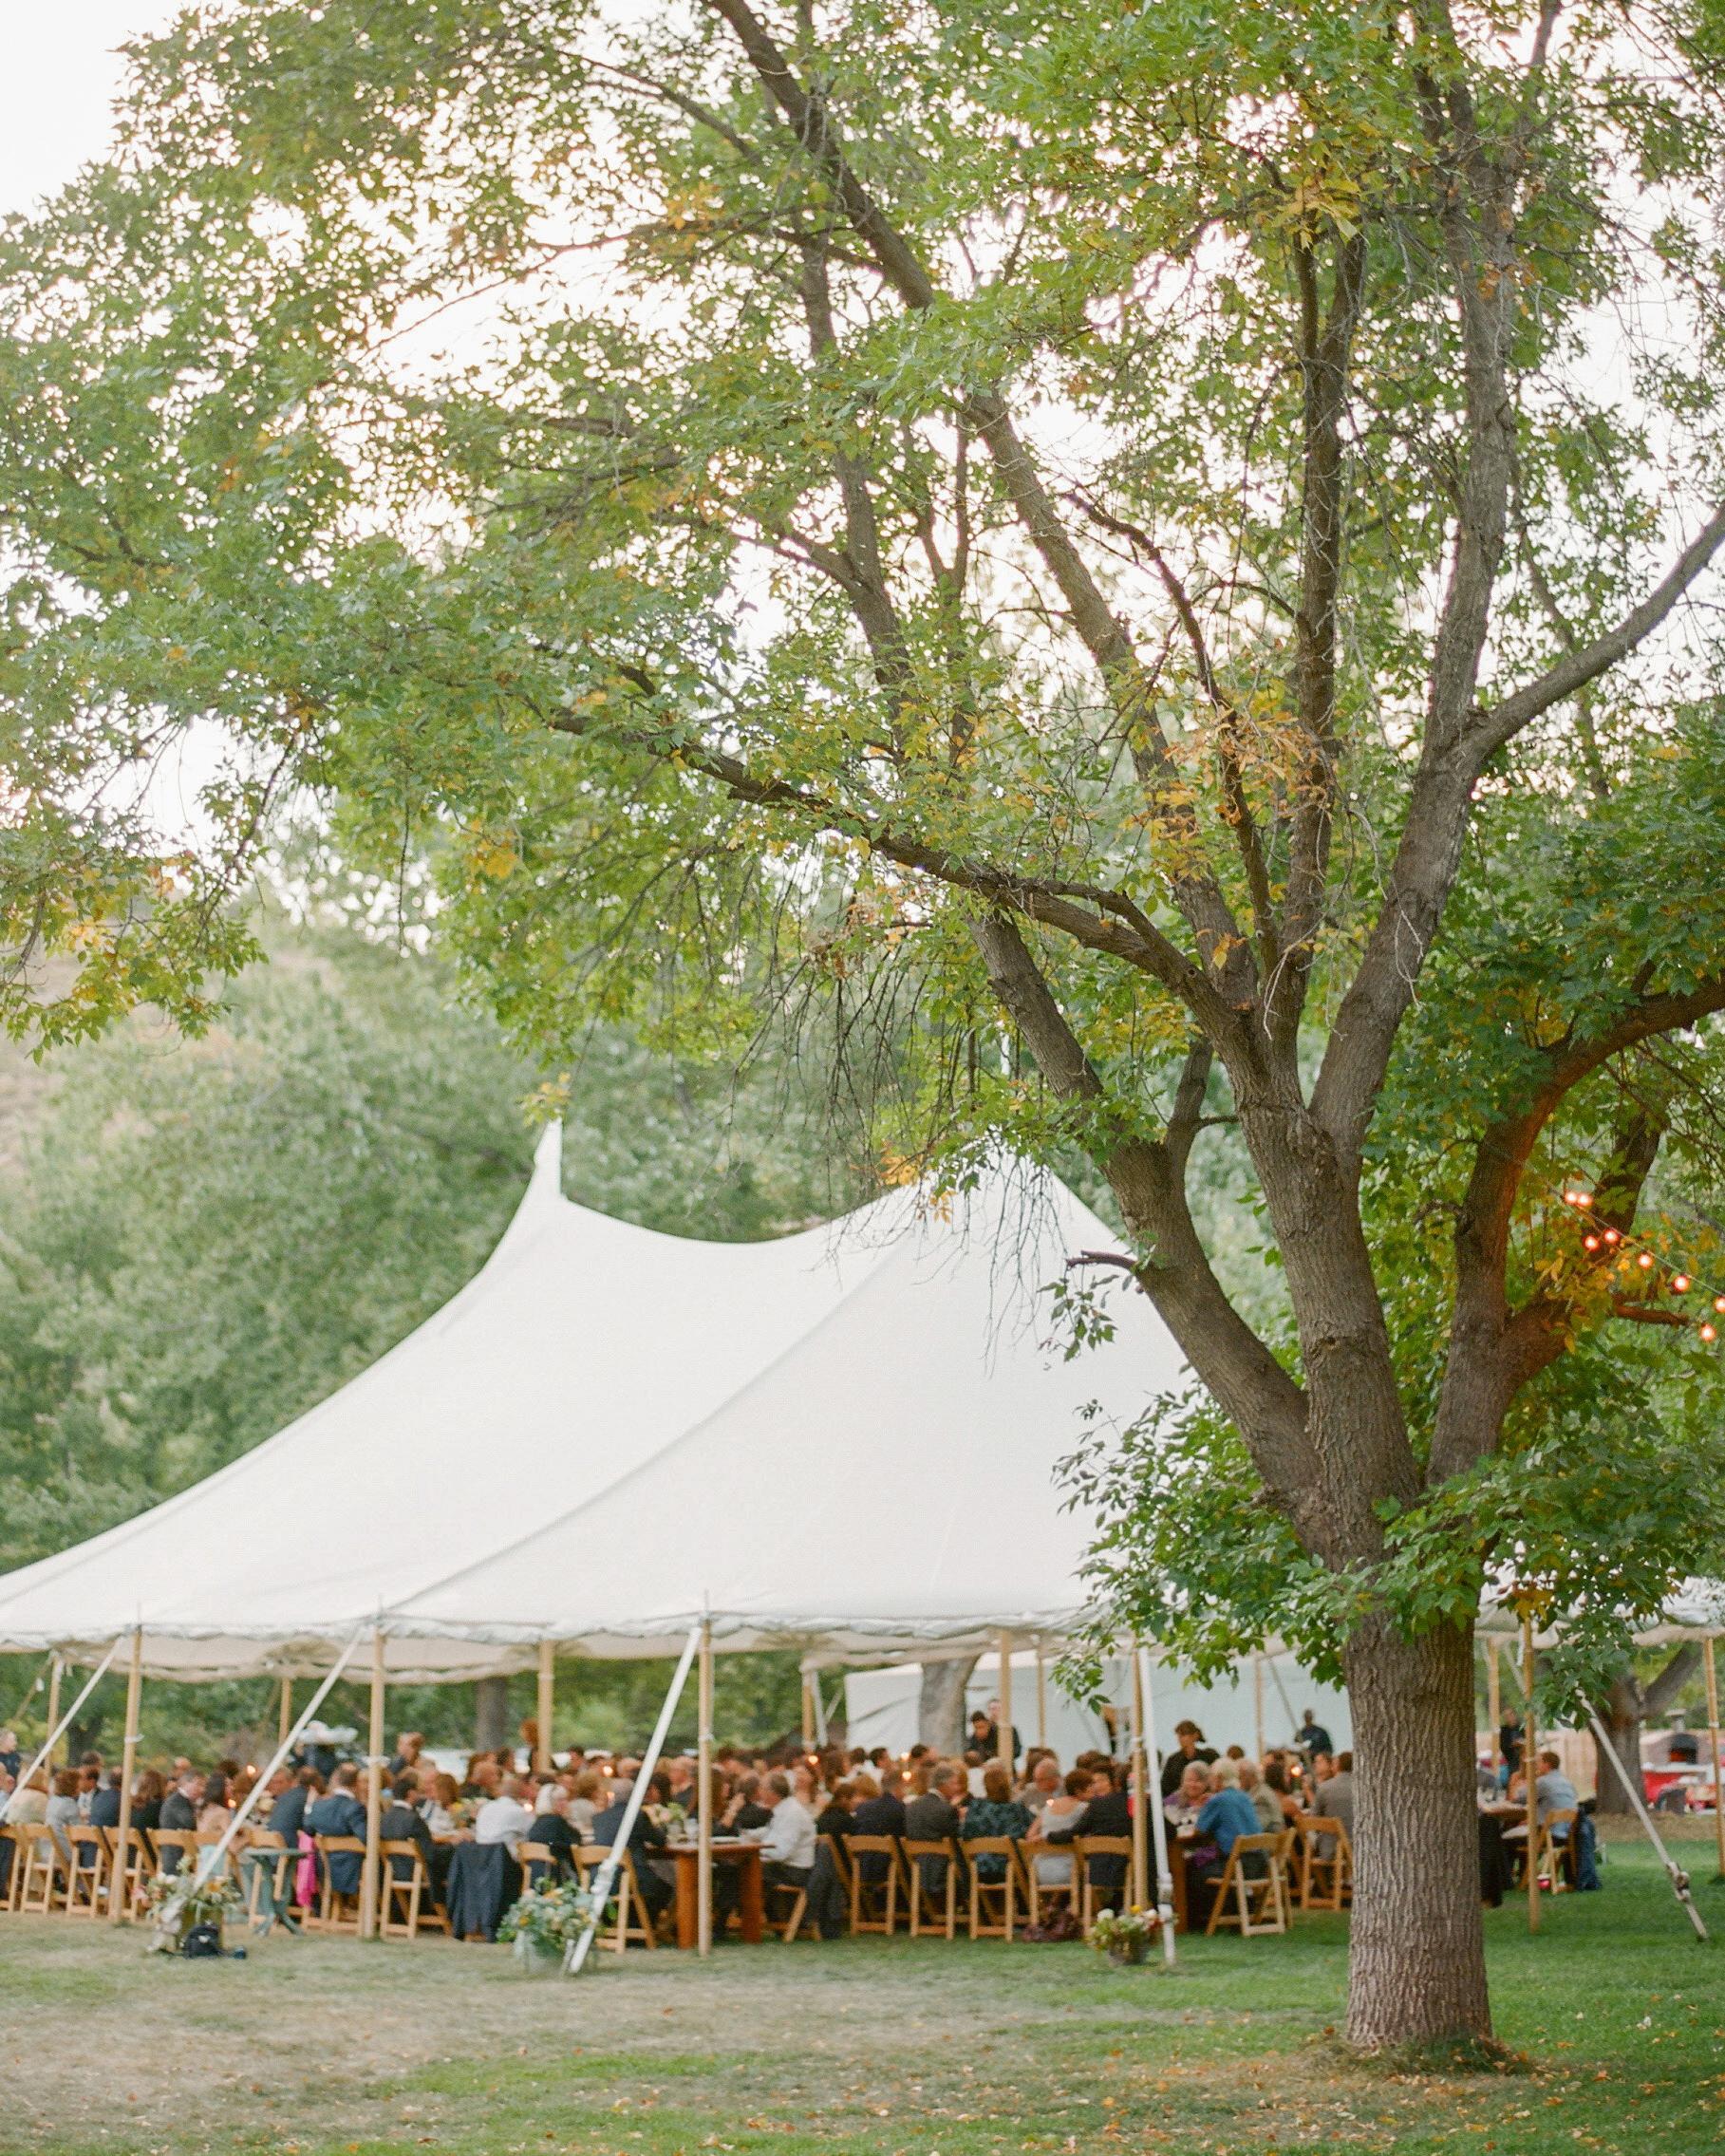 lana-danny-wedding-tent-645-s111831-0315.jpg